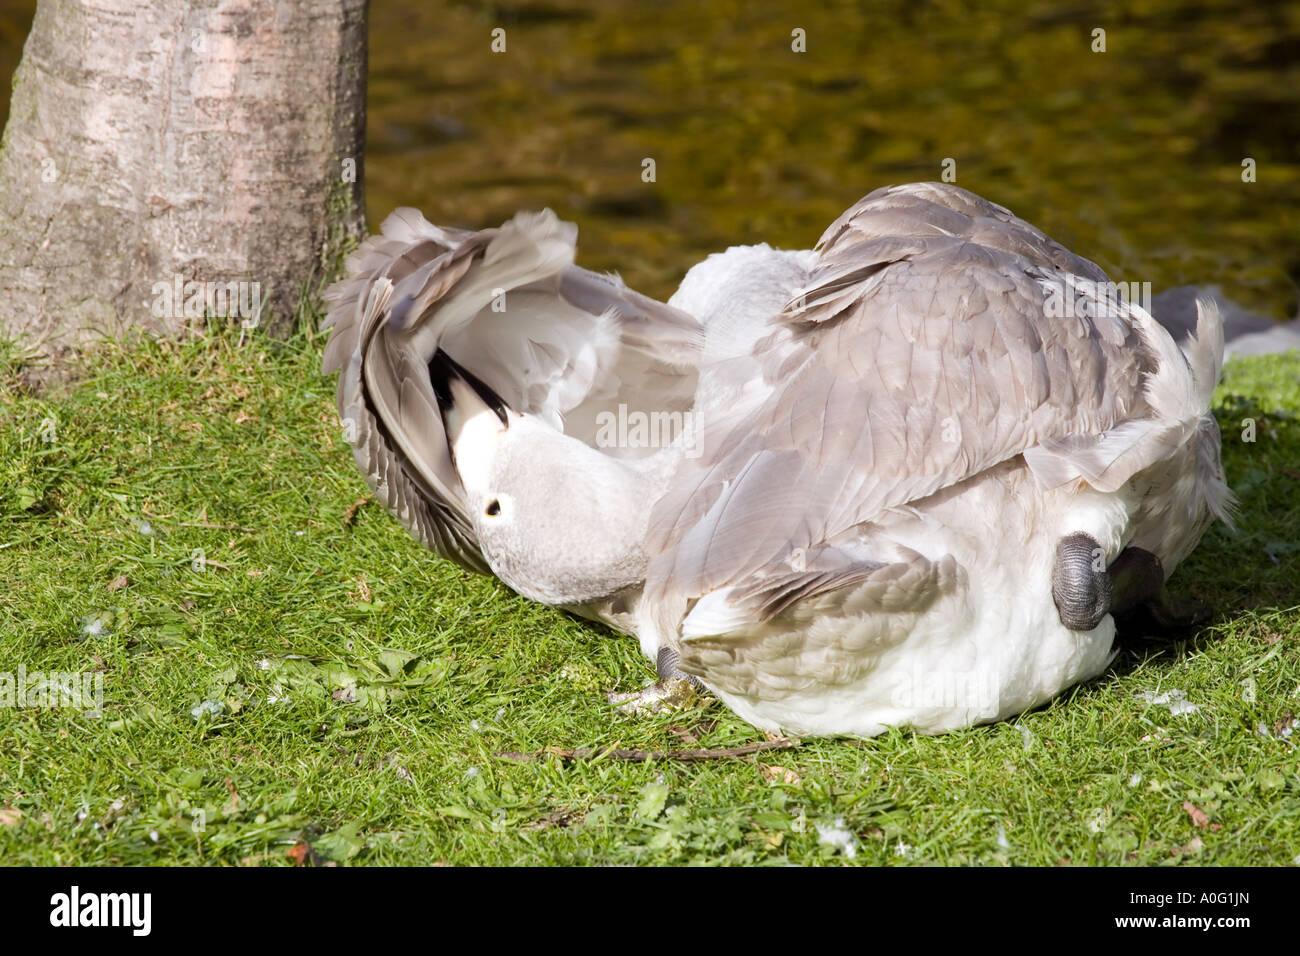 Immature whooper swan (Cygnus Cygnus) - Stock Image